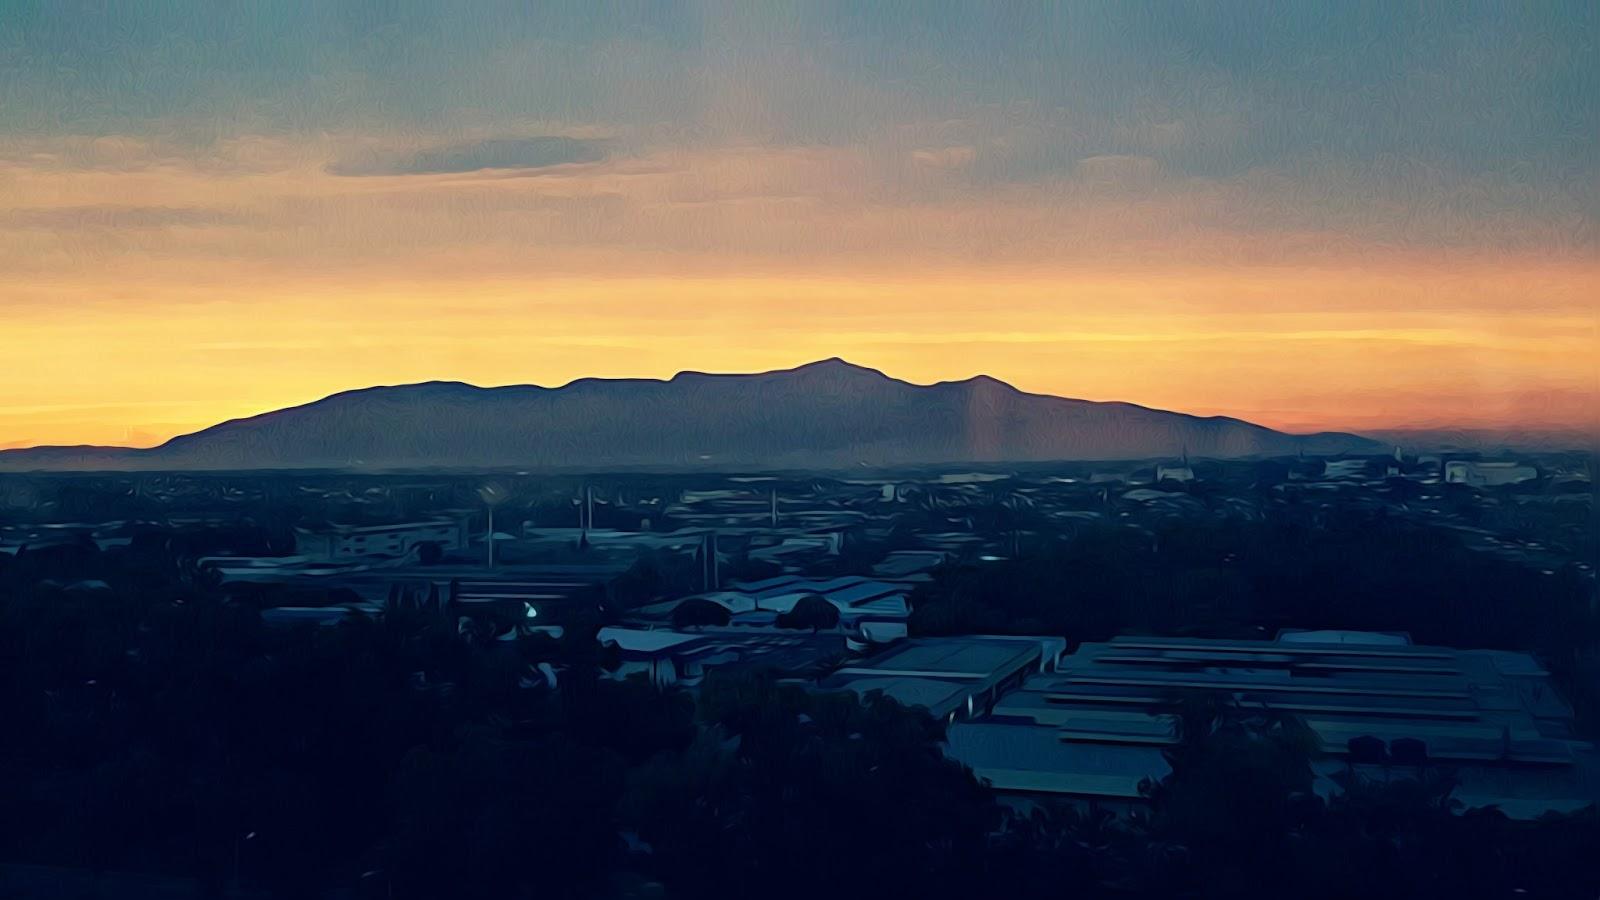 Sunset Gunung Jerai